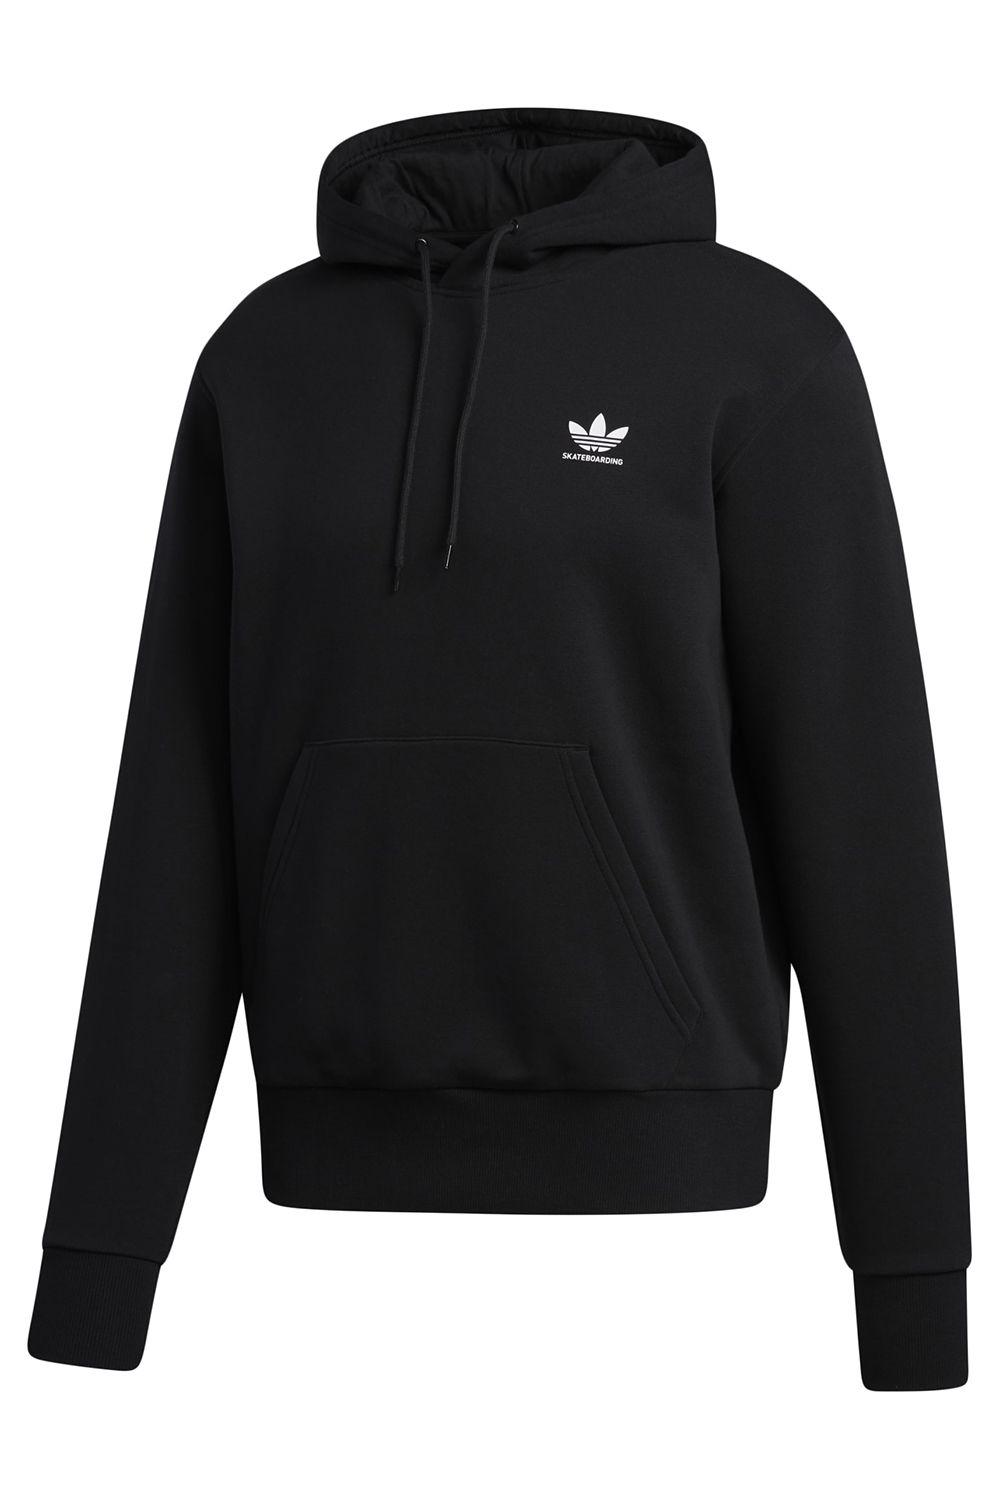 Adidas Sweat Hood 2.0 LOGO HOODIE Black/White